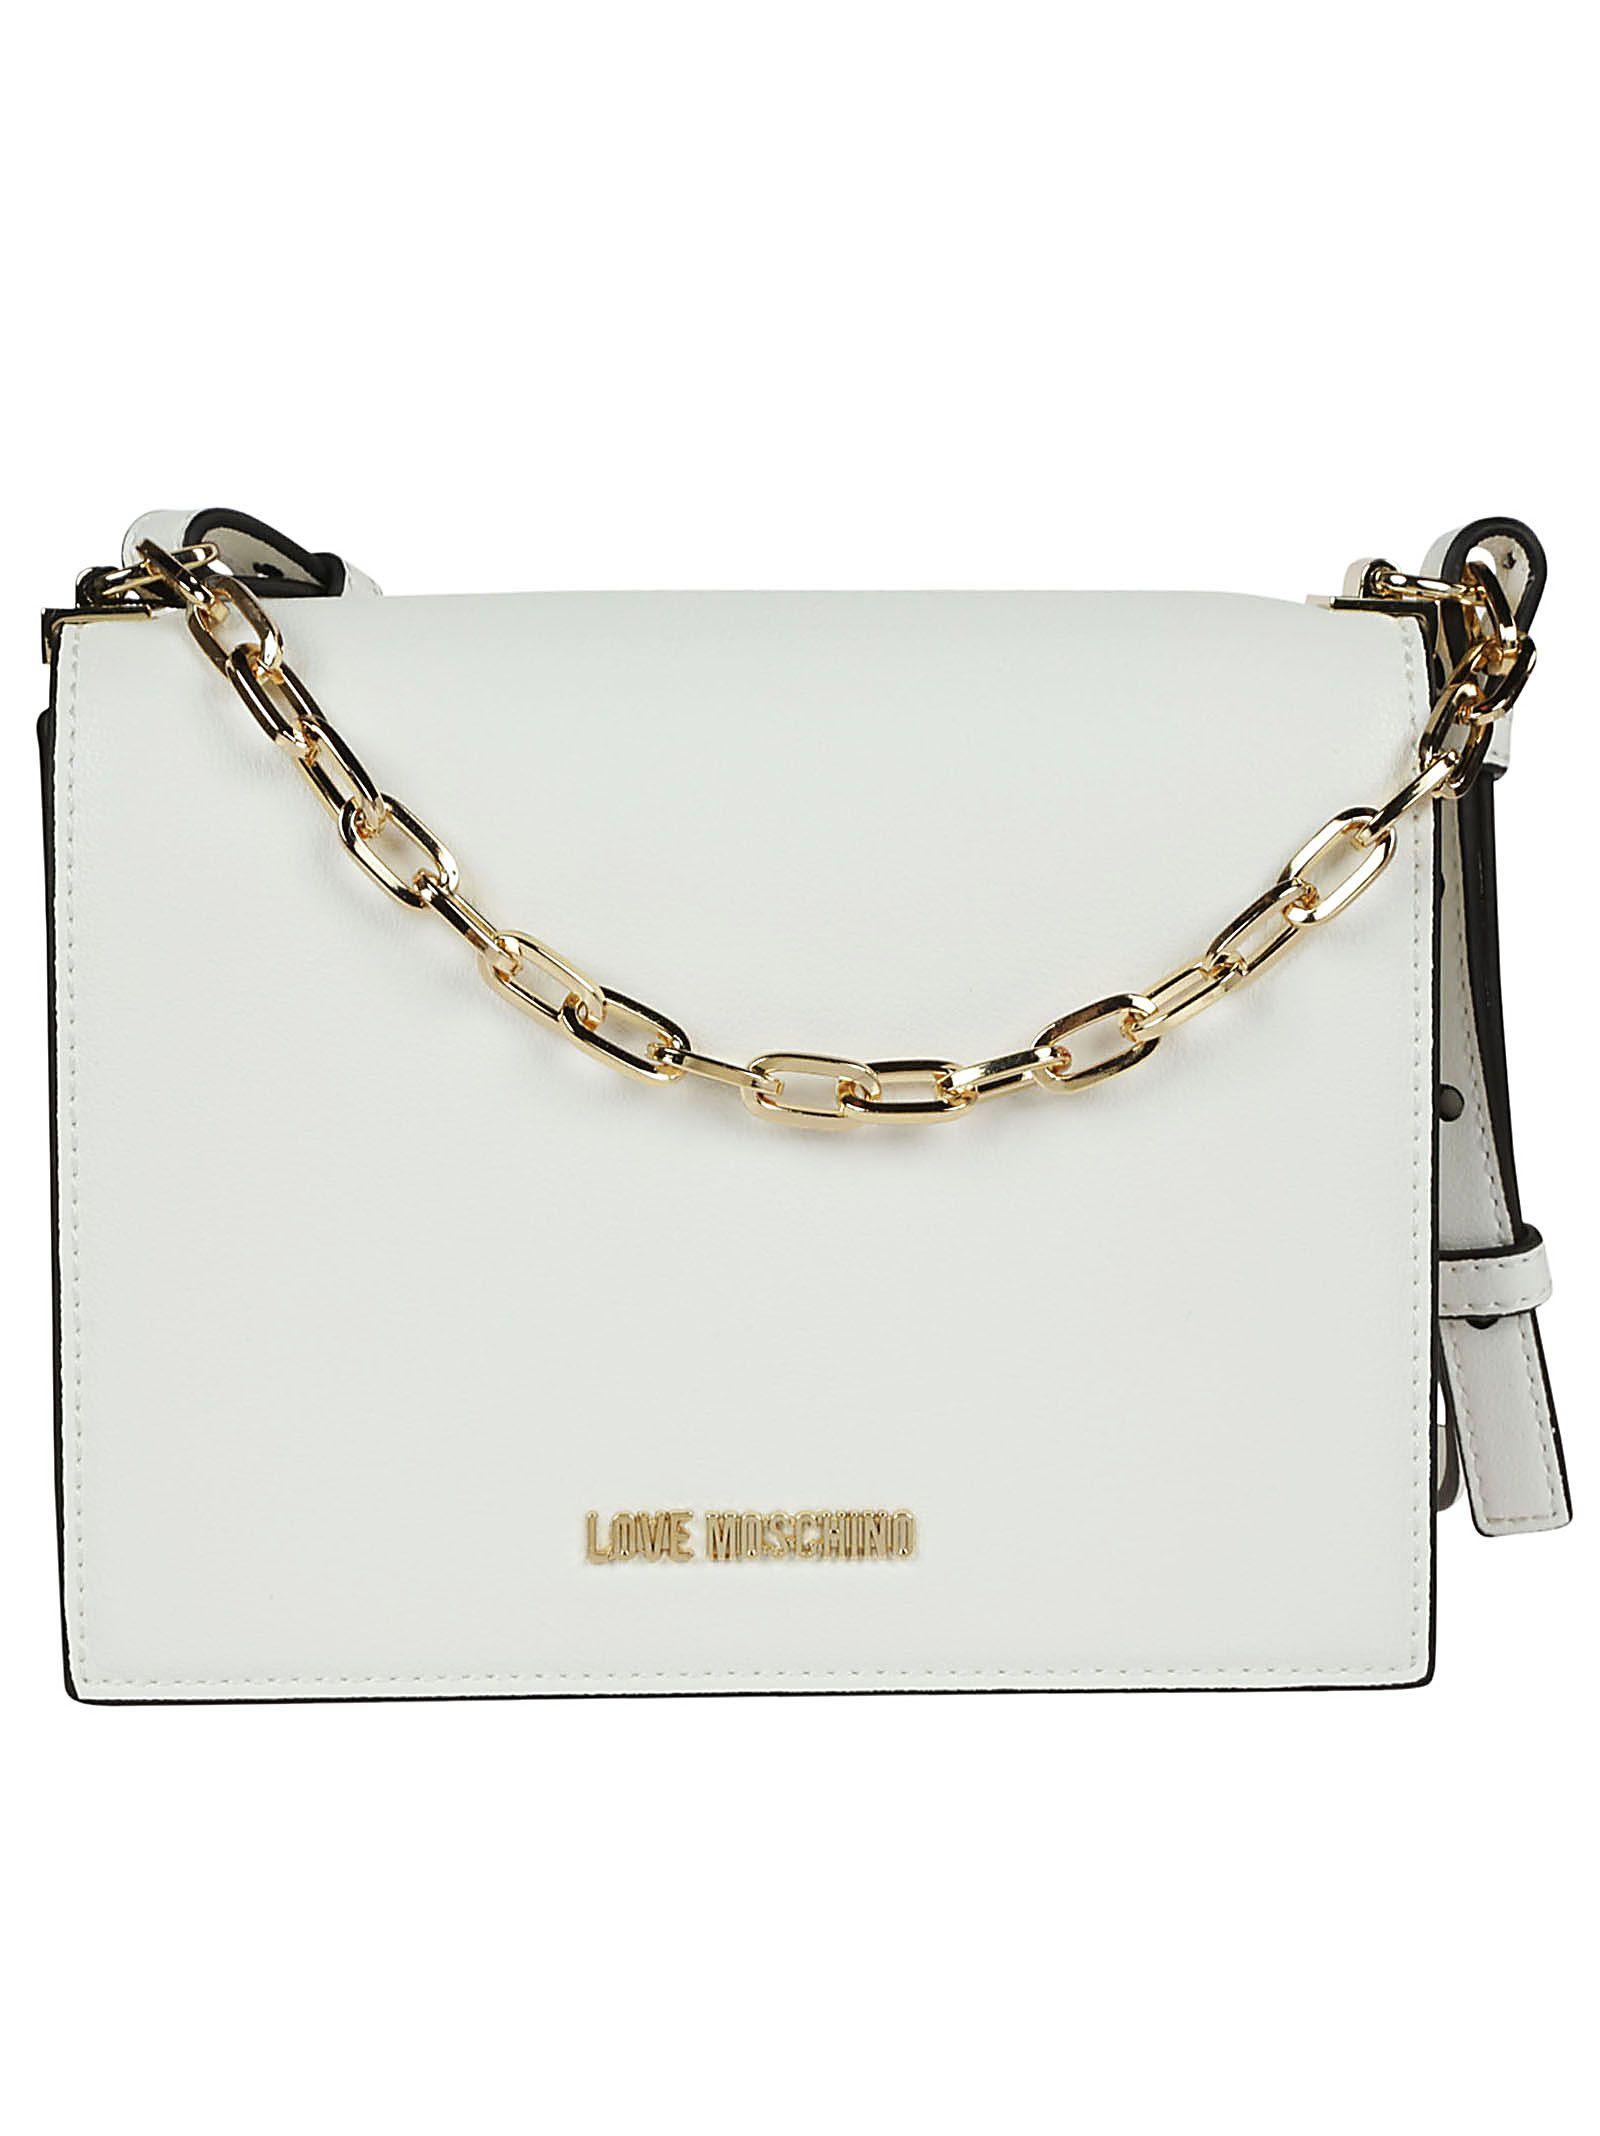 Moschino Chain Strap Crossbody Bag